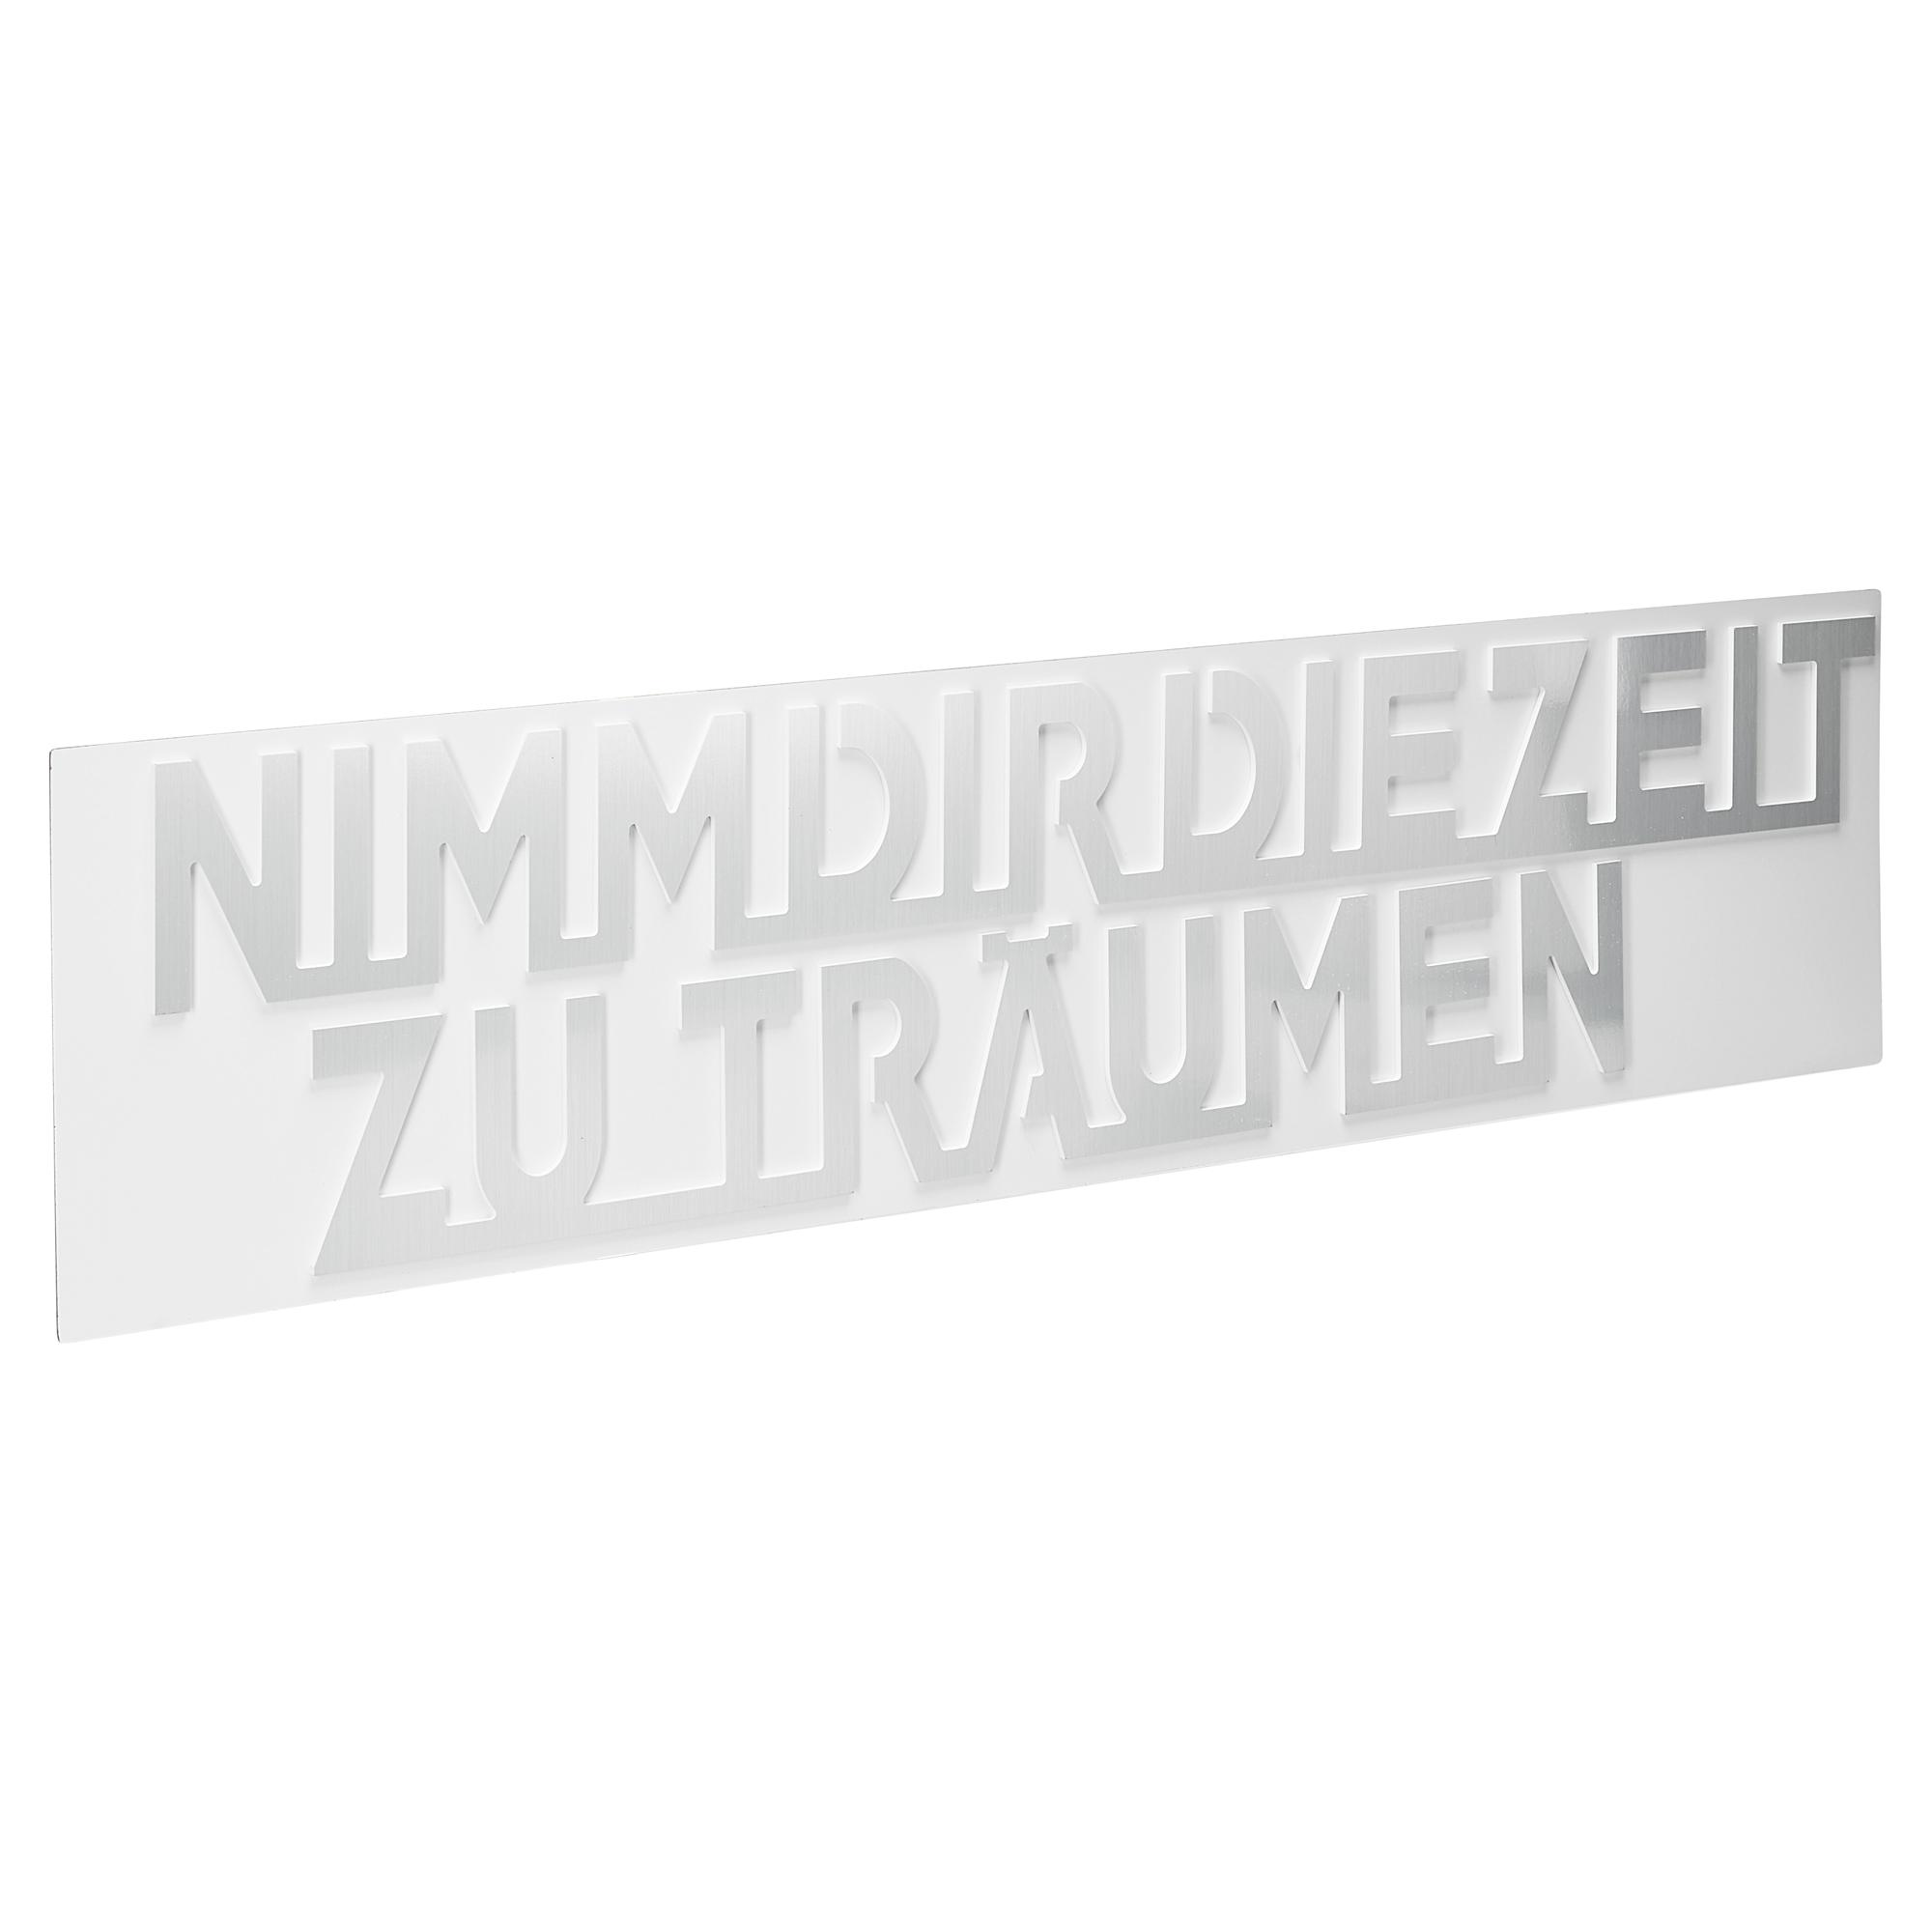 Pro Art Dekoschriftzug Traumen 30 X 120 Cm ǀ Toom Baumarkt